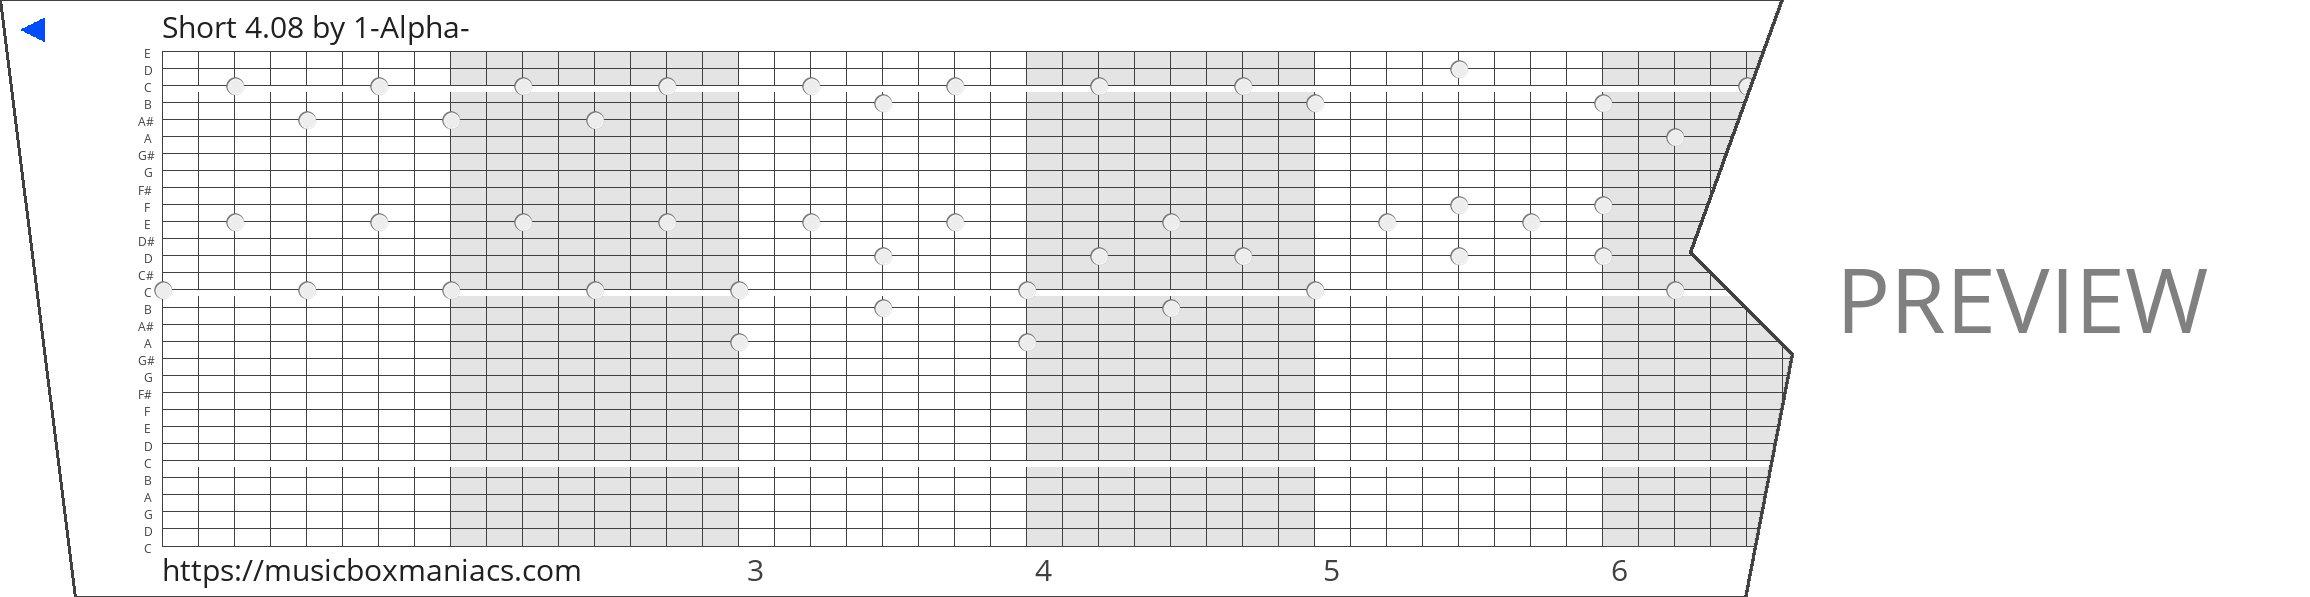 Short 4.08 30 note music box paper strip